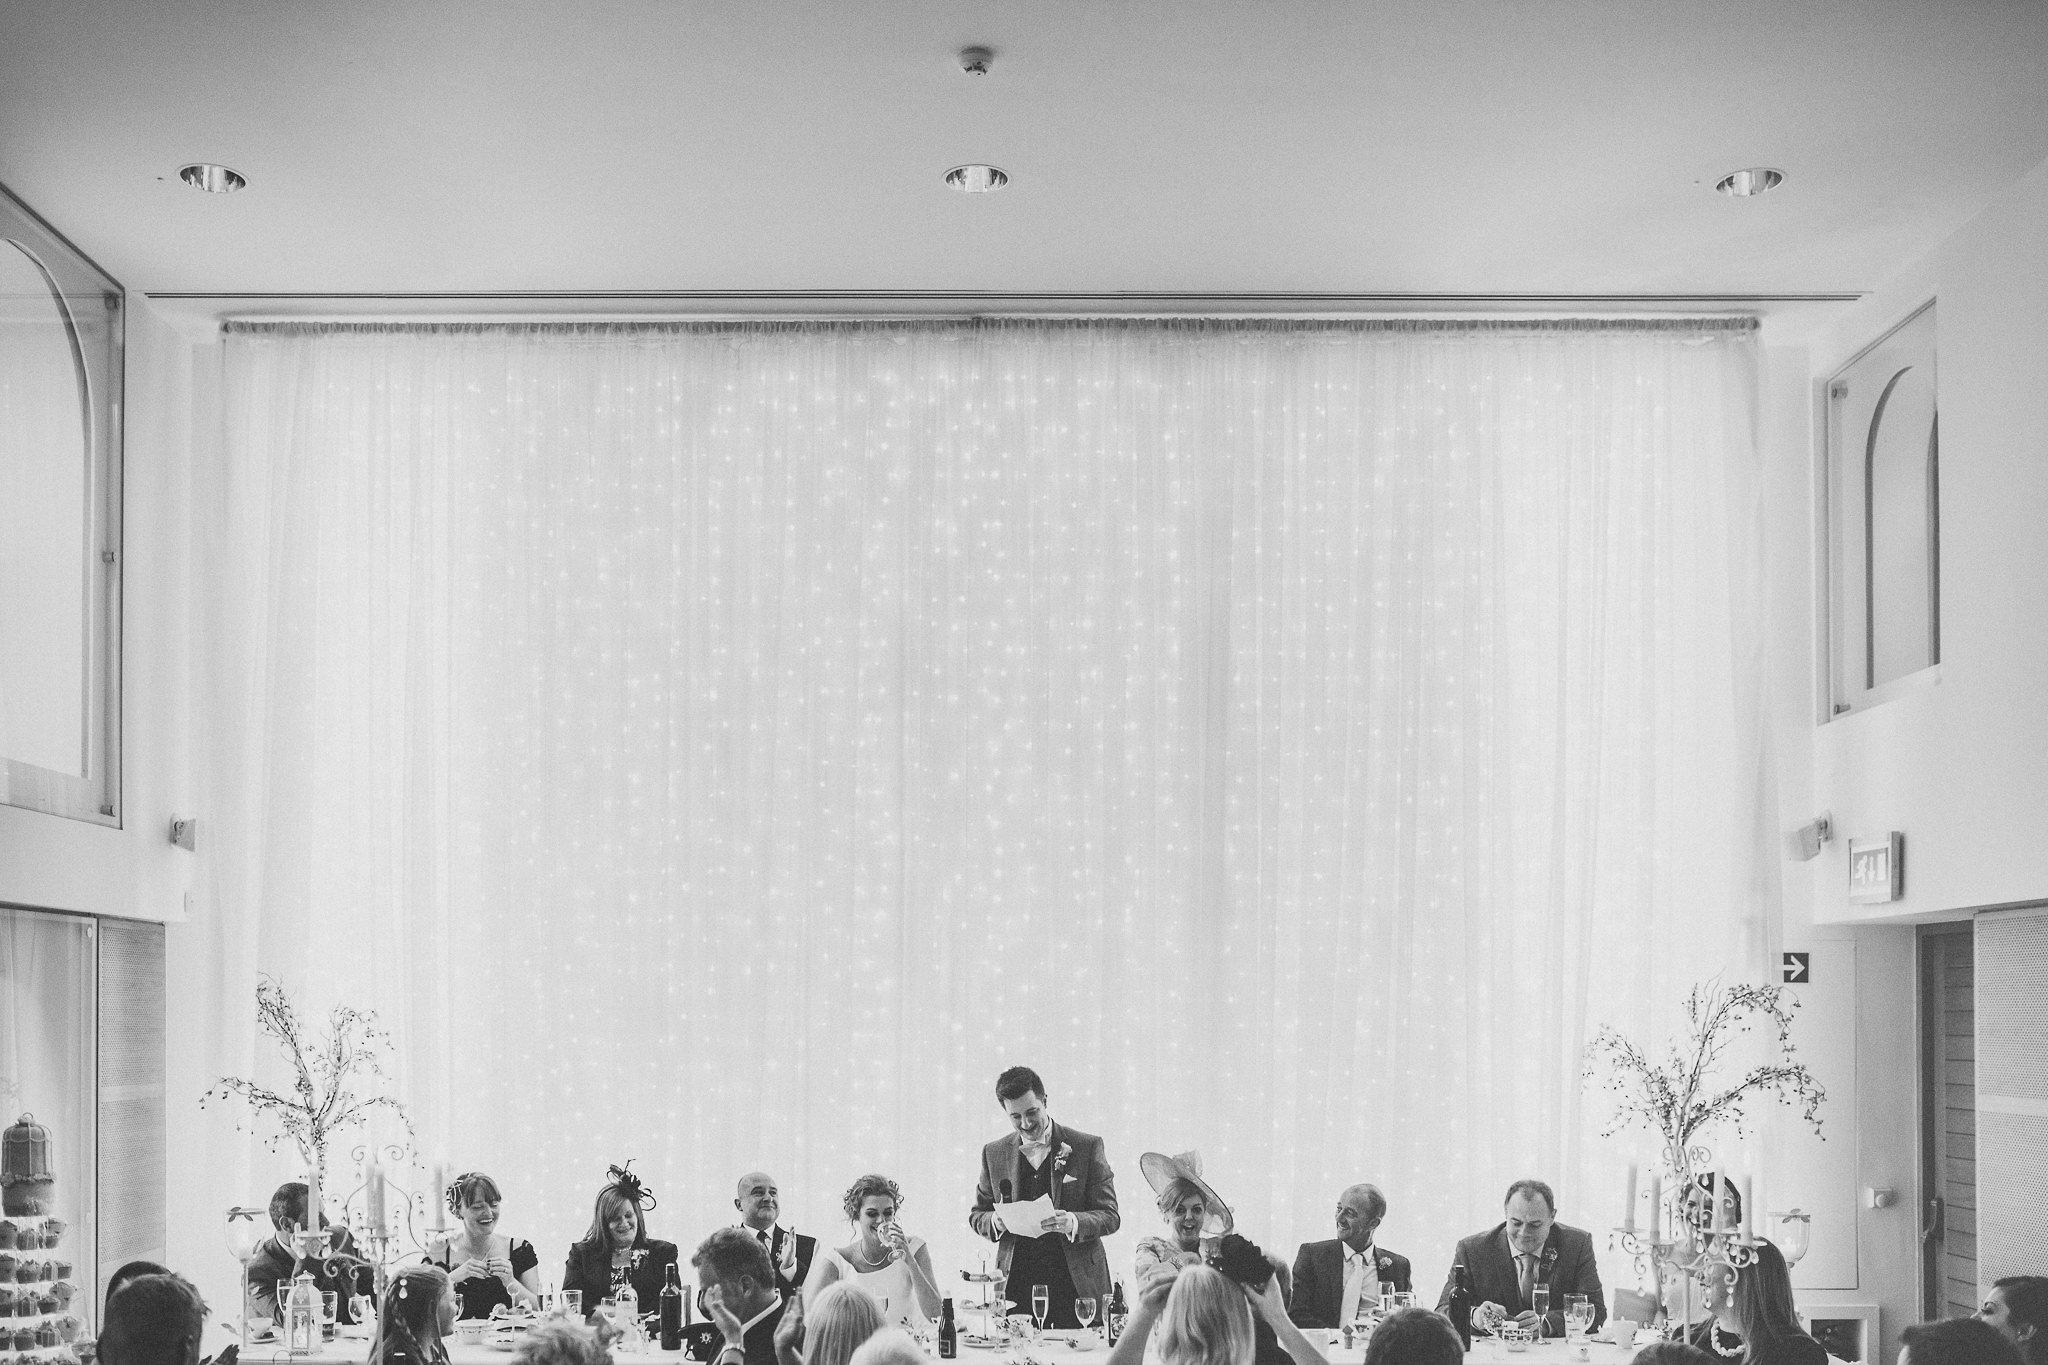 Lancashire-Creative-natural-documentary-wedding-photography-90070